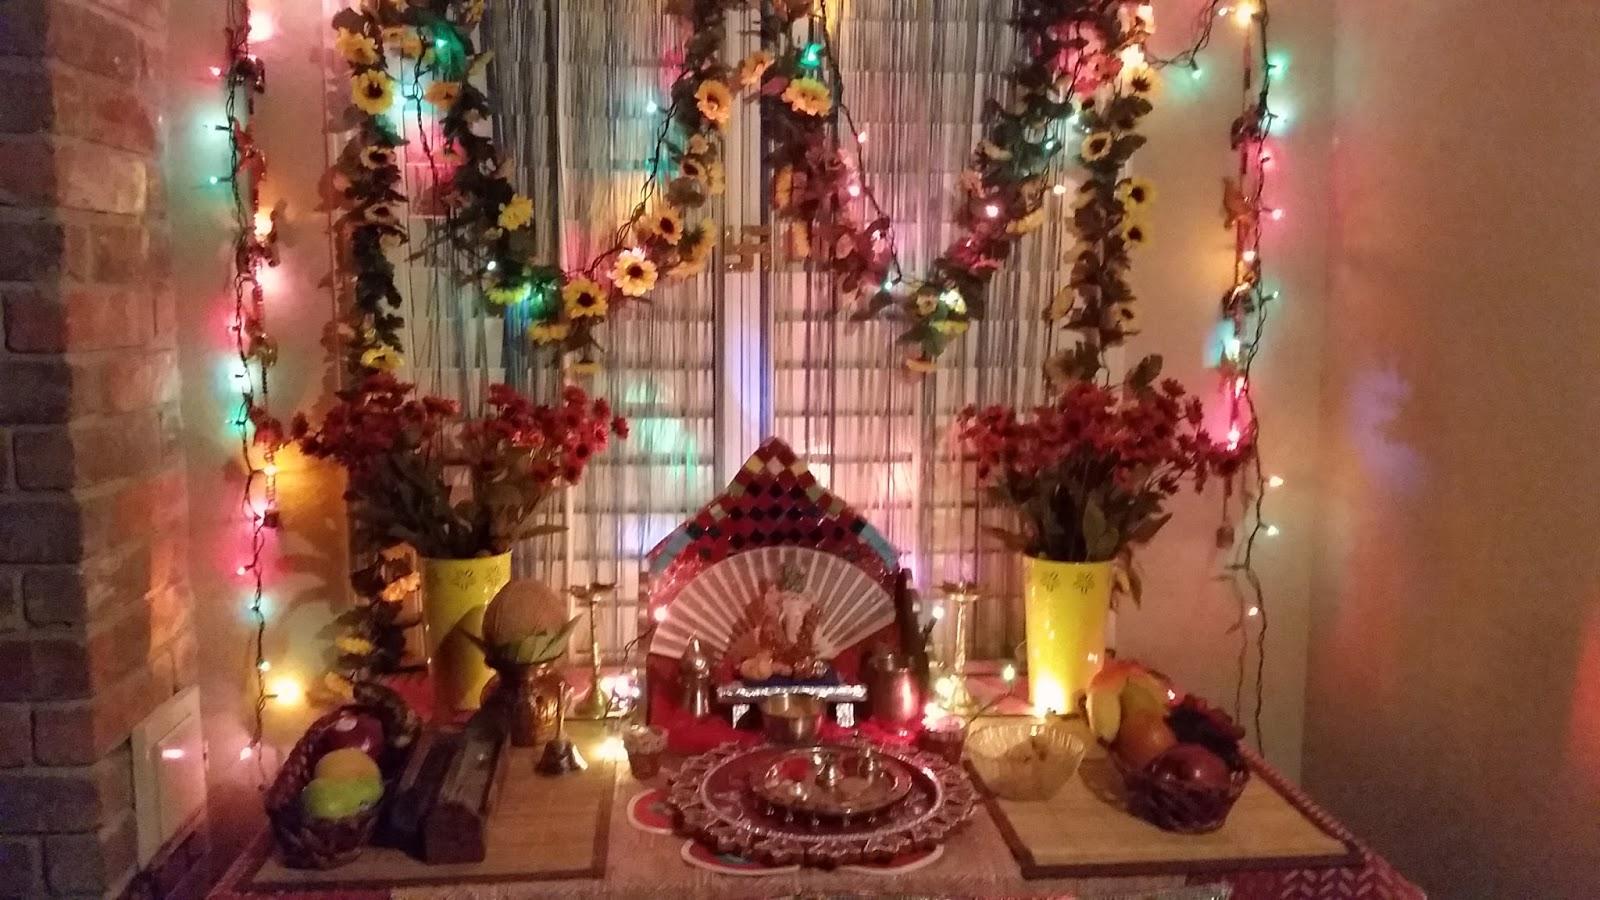 Ganpati Decoration Pictures : Desikalakar ganpati decoration